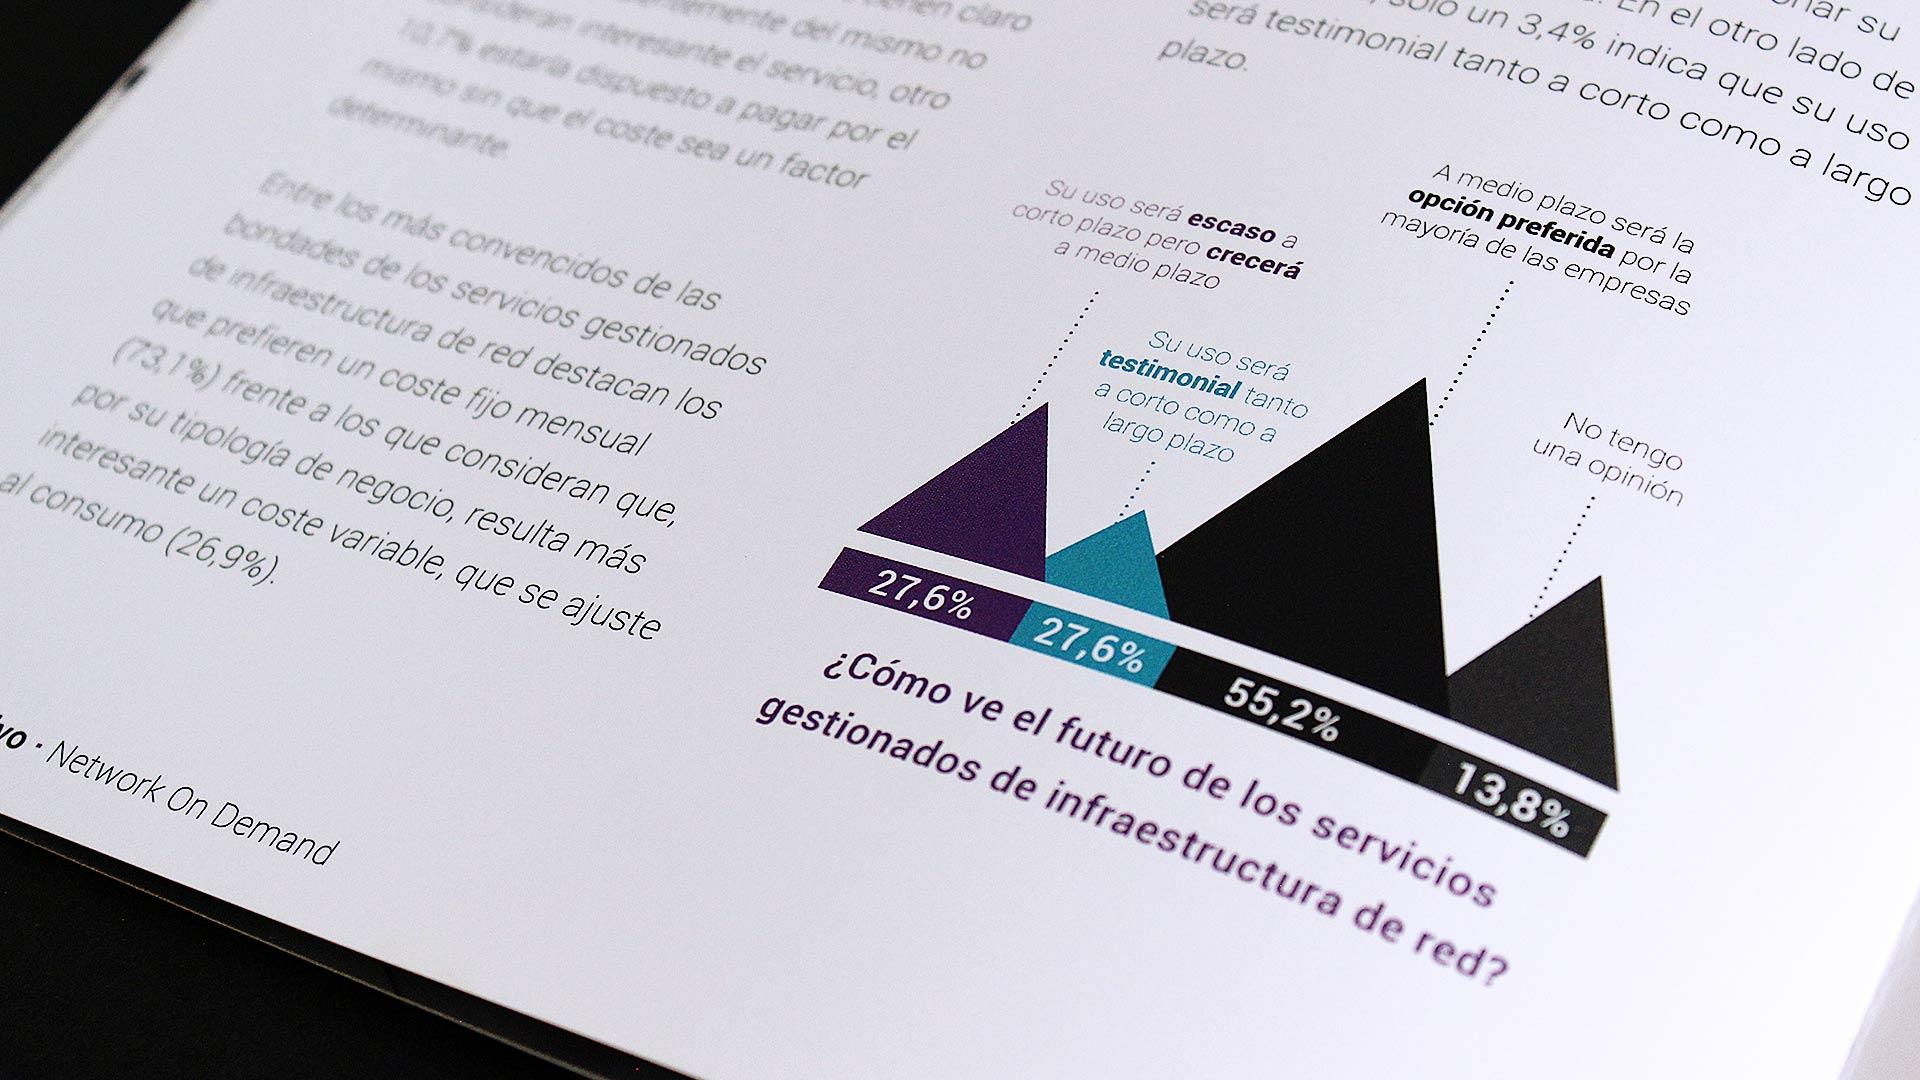 alcatel-content-marketing-informe-resumen-ejecutivo-networkondemand-ebook-2016-21